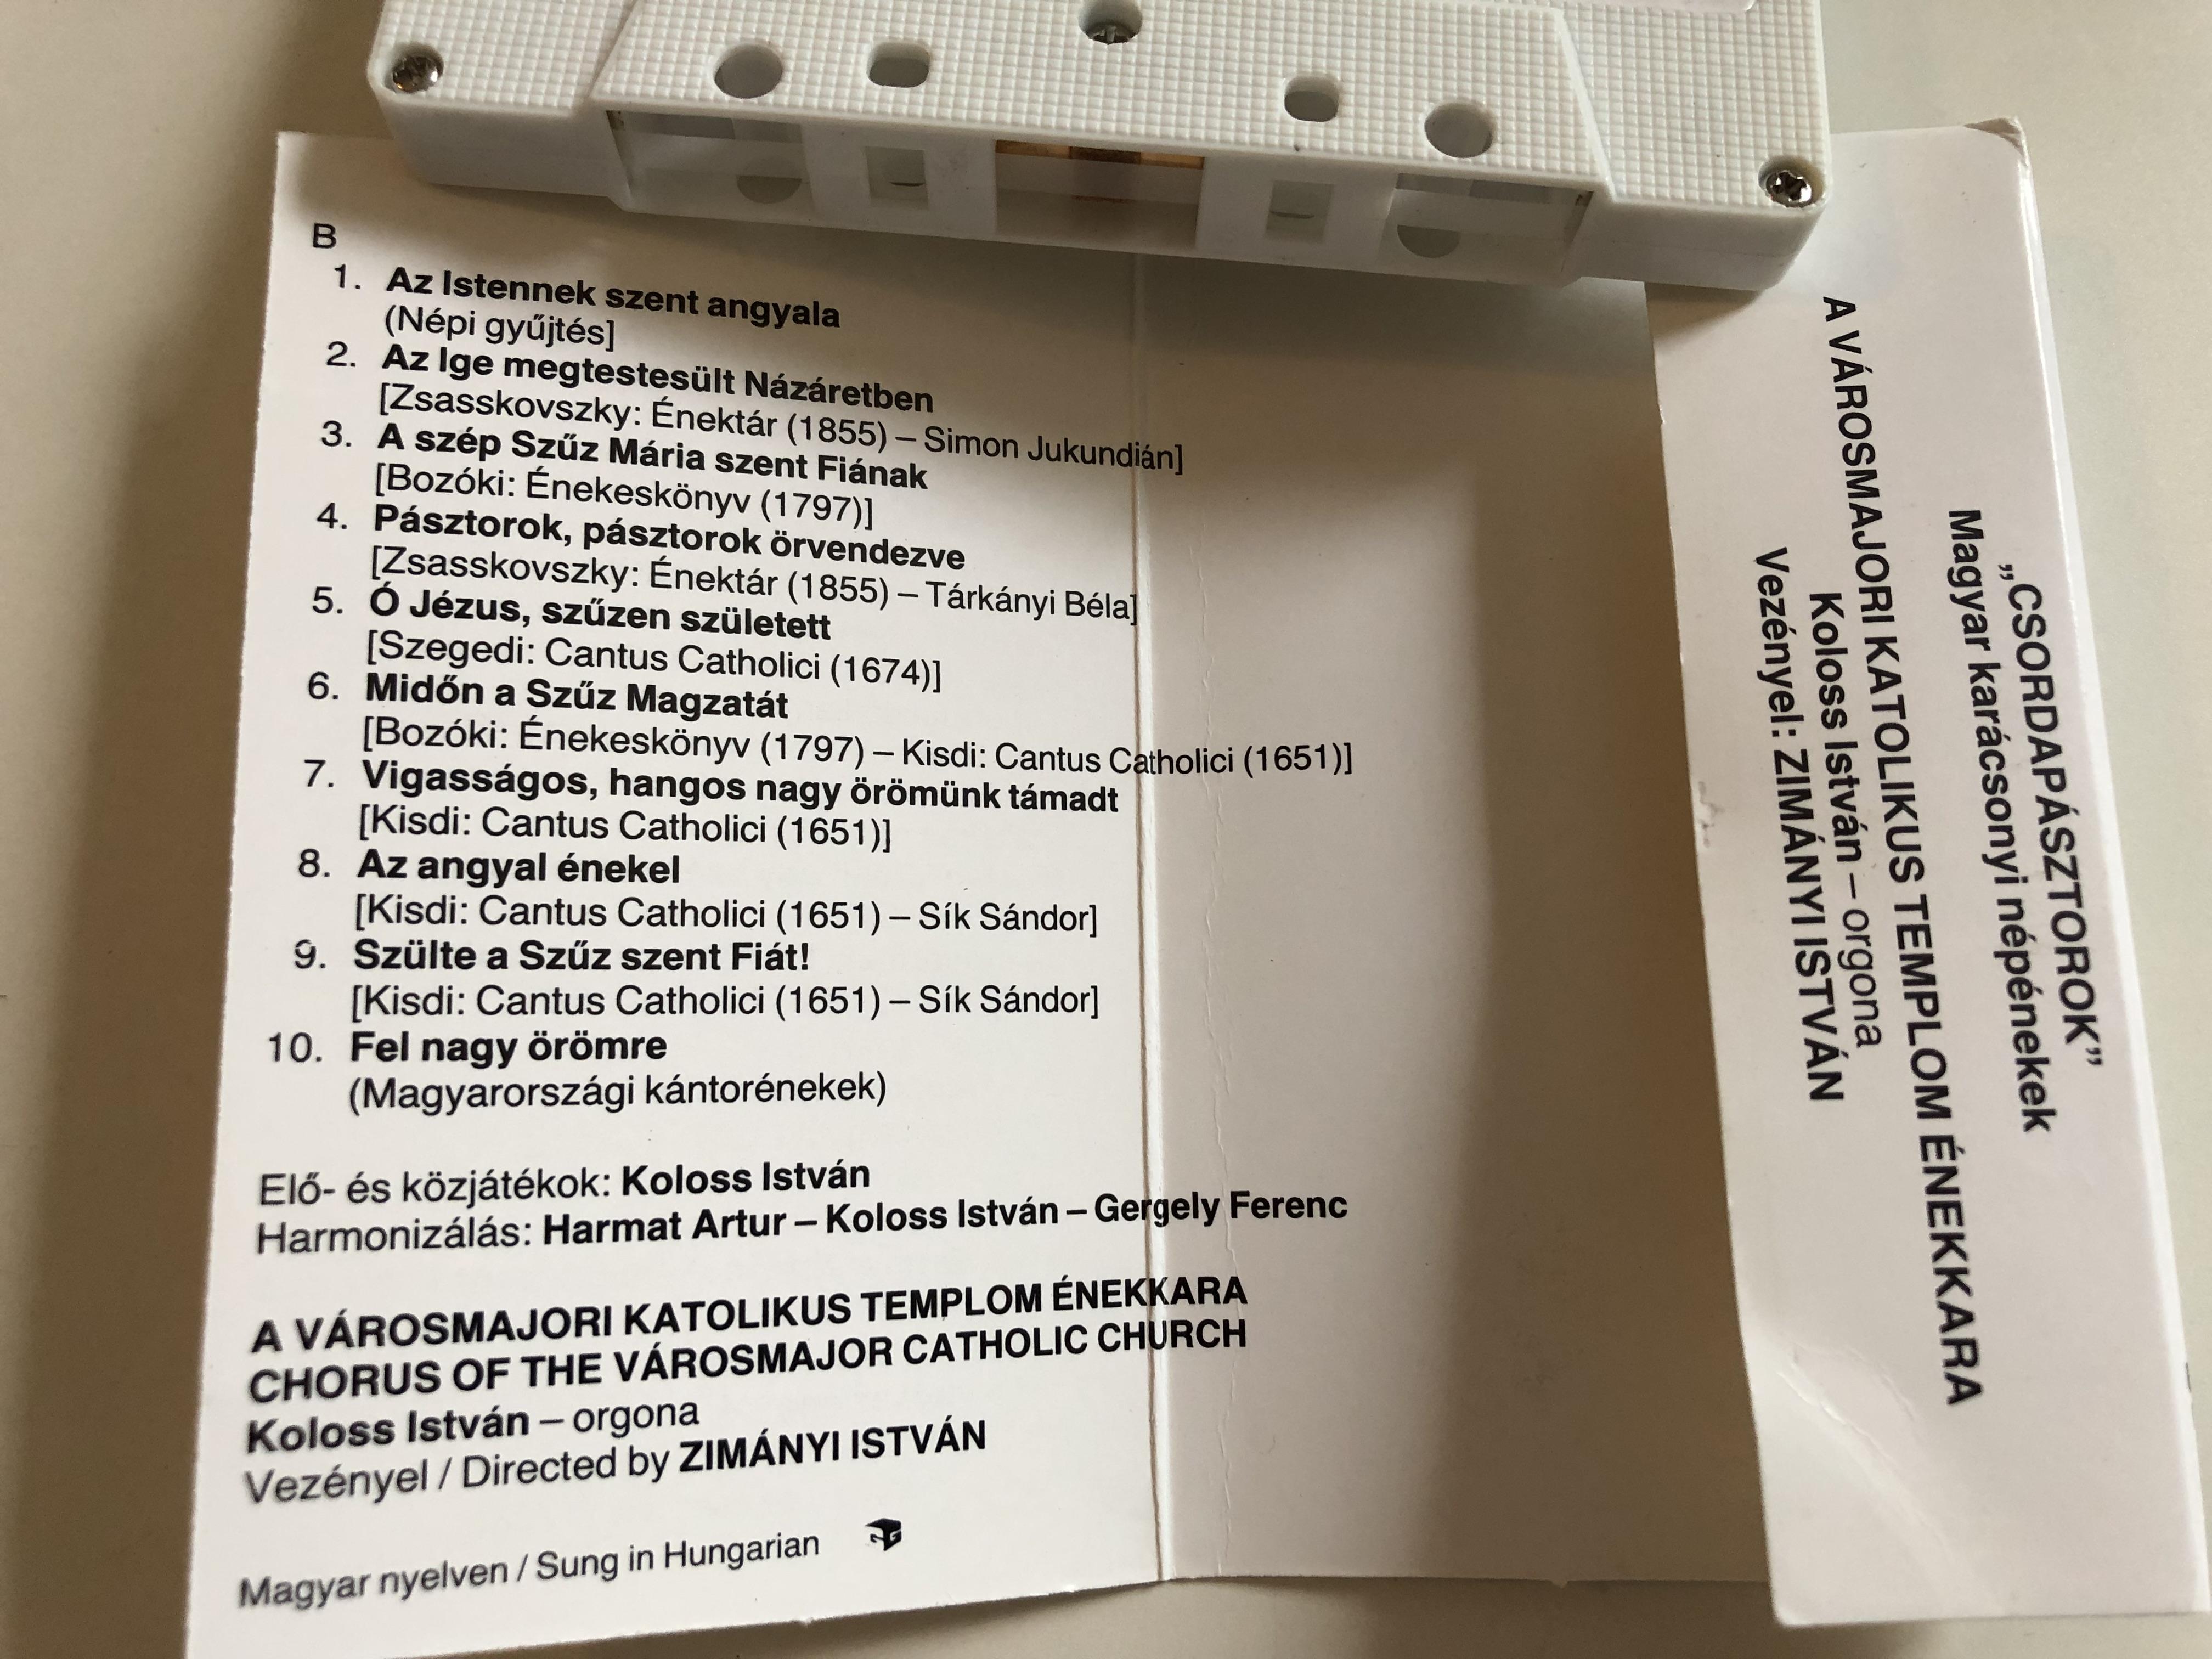 csordap-sztorok-magyar-kar-csonyi-n-p-nekek-hungarian-christmas-carols-a-v-rosmajori-katolikus-templom-nekkara-chorus-of-the-varosmajor-catholic-church-conducted-zim-nyi-istv-n-organ-4-.jpg